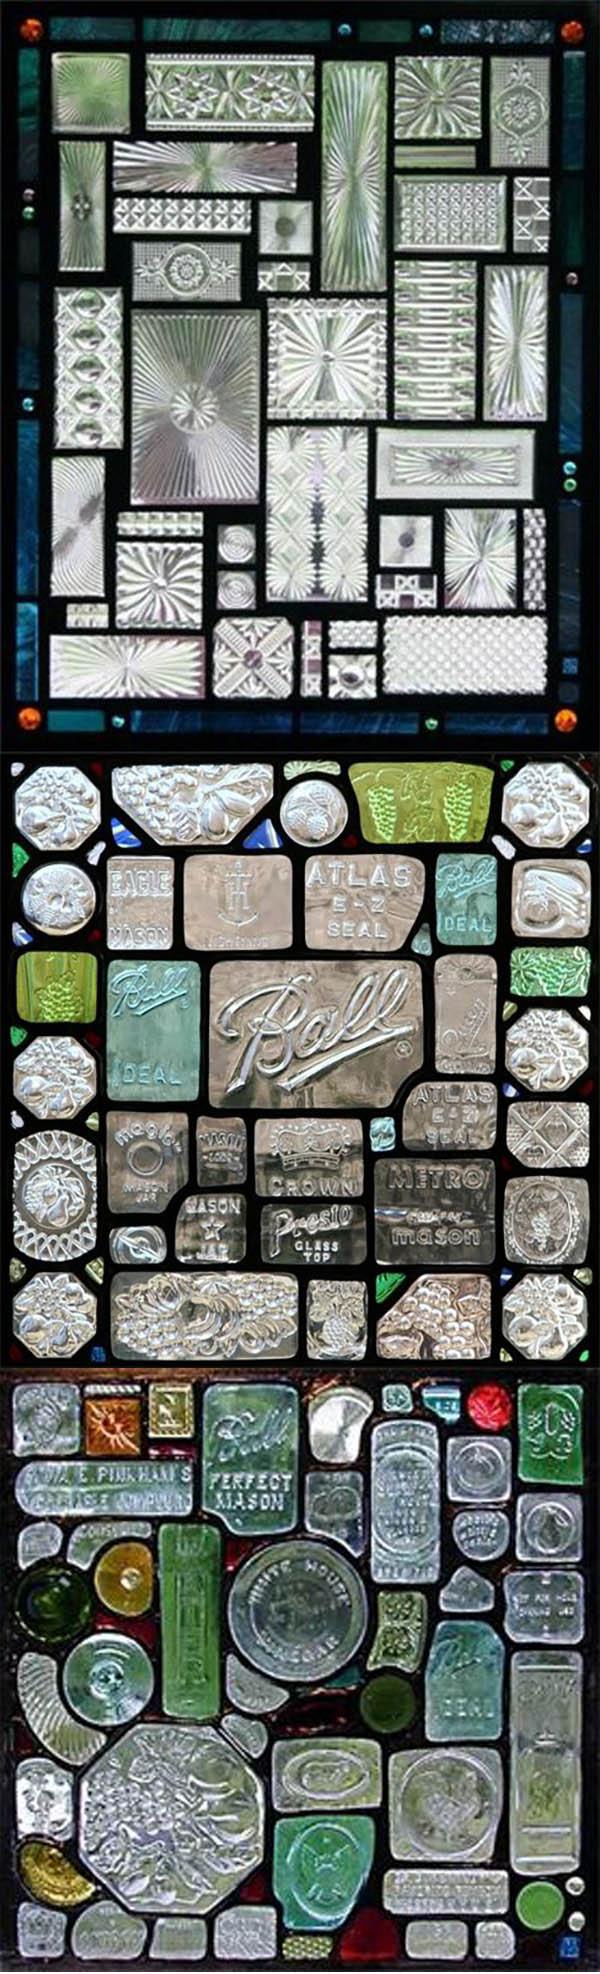 Terra Sophia - Les vitreaux en verre recyclé de Daniel Maher